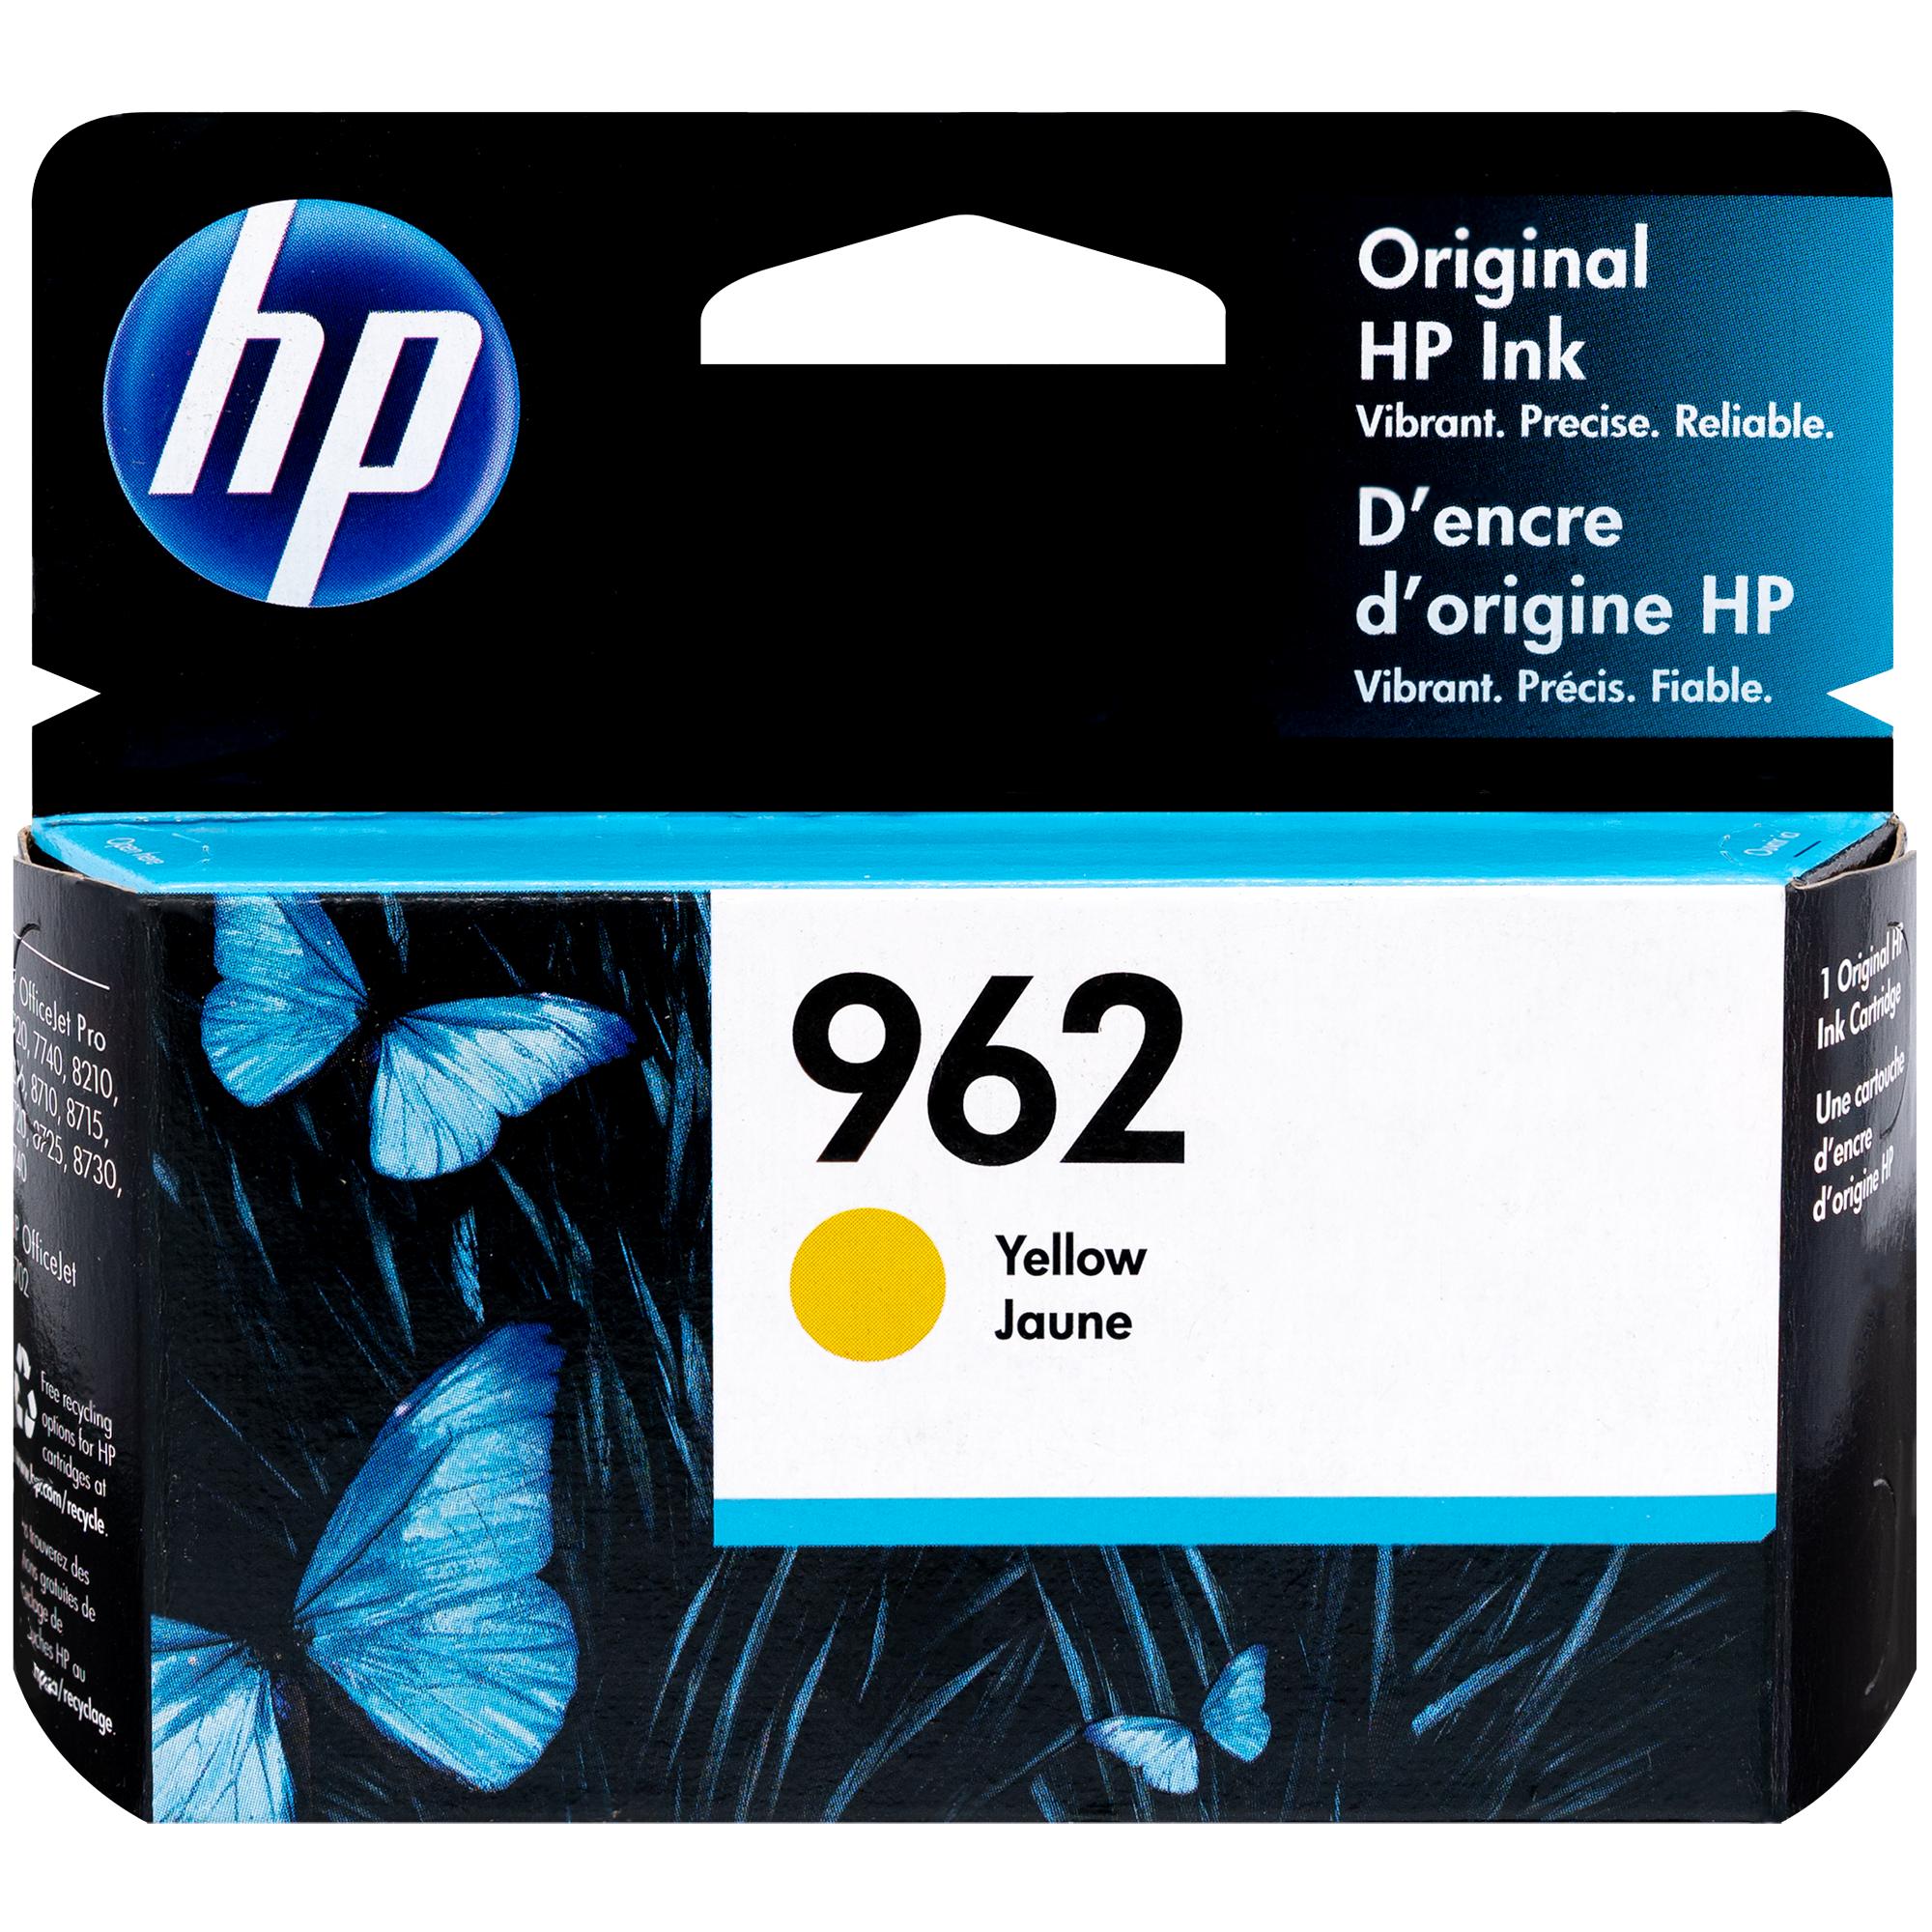 3HZ98AN   HP 962   Original HP Ink Cartridge - Yellow